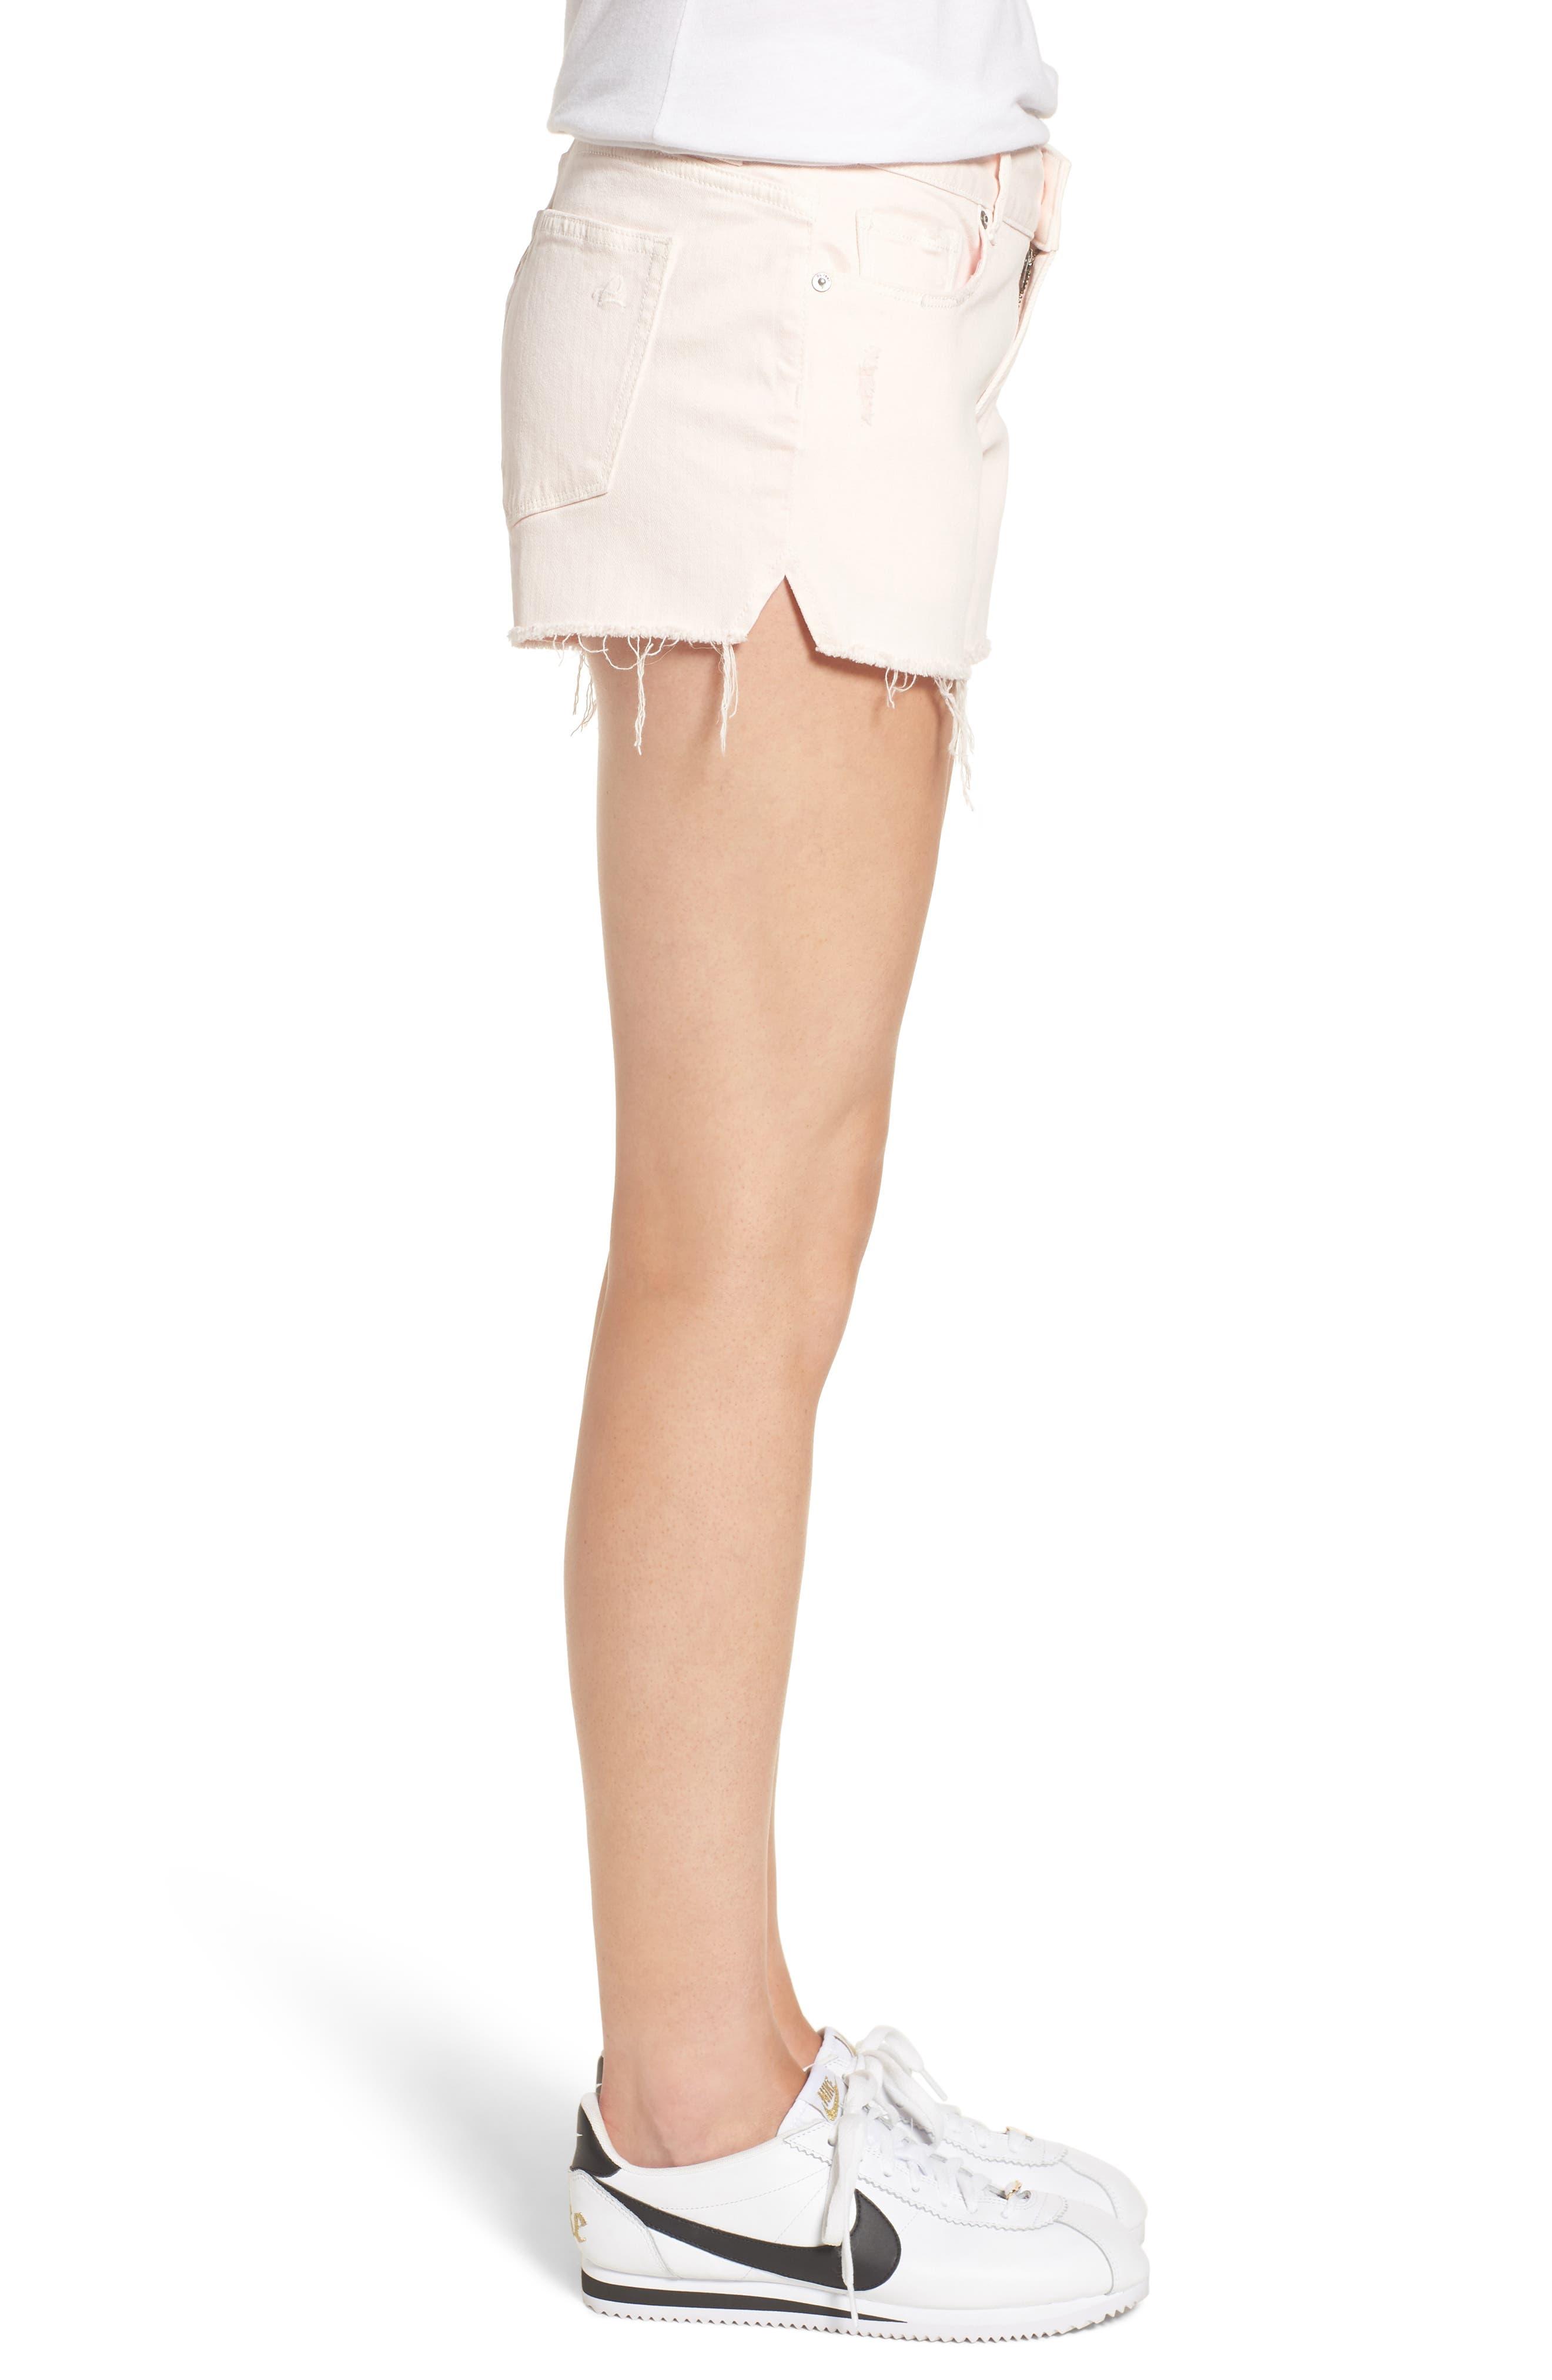 Renee Notch Raw Hem Denim Shorts,                             Alternate thumbnail 3, color,                             Blush Pink